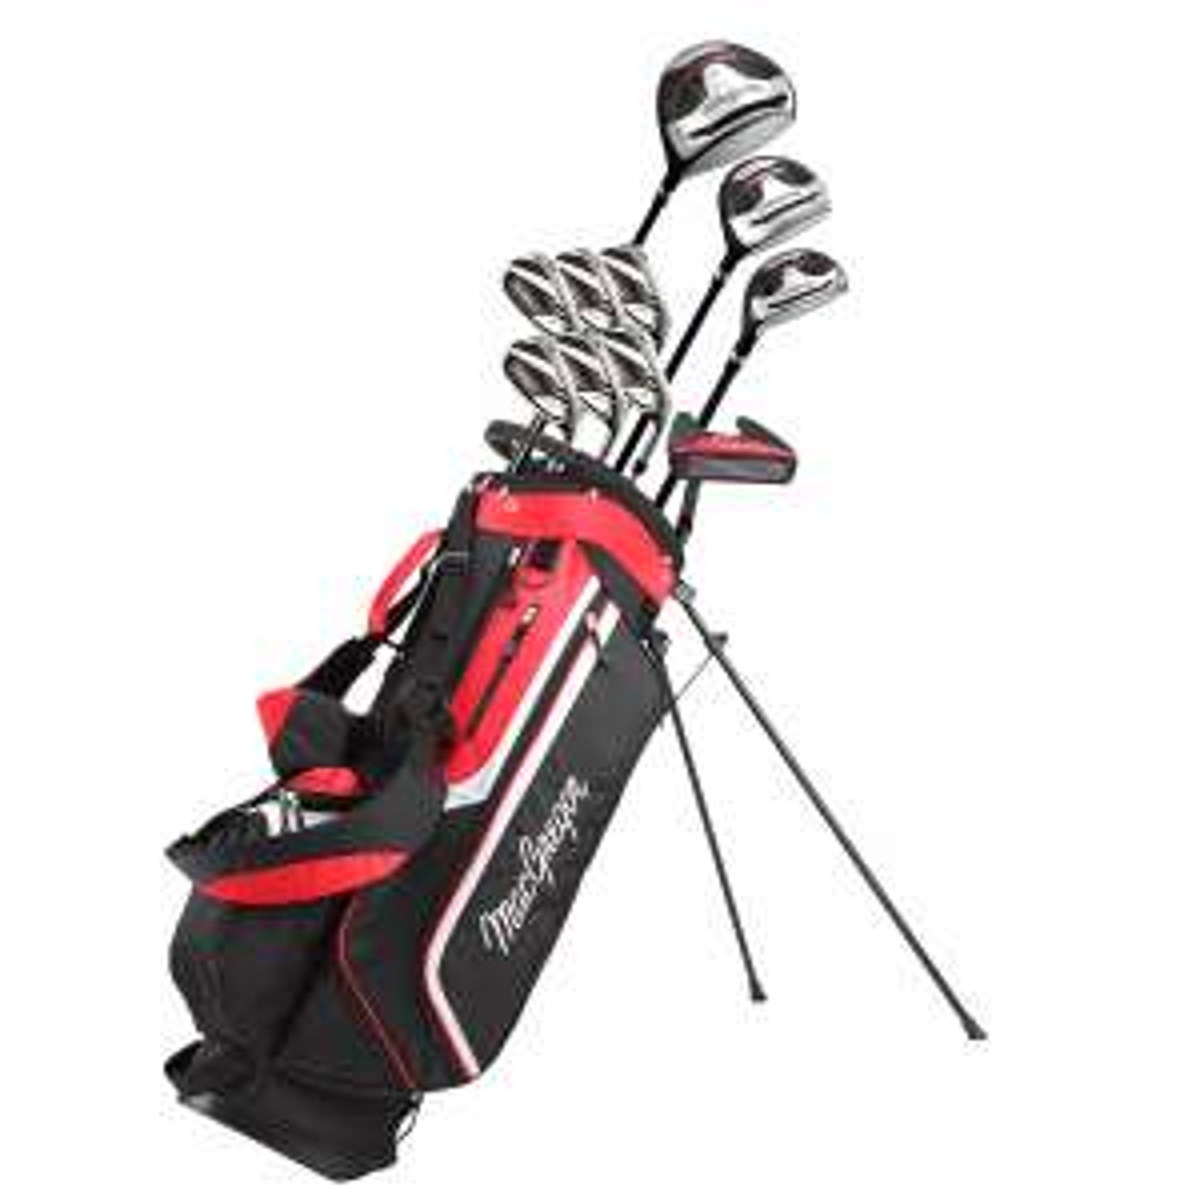 MacGregor MacGregor CG3000 Stand Bag Steel Package Set £149.40 @ American Golf